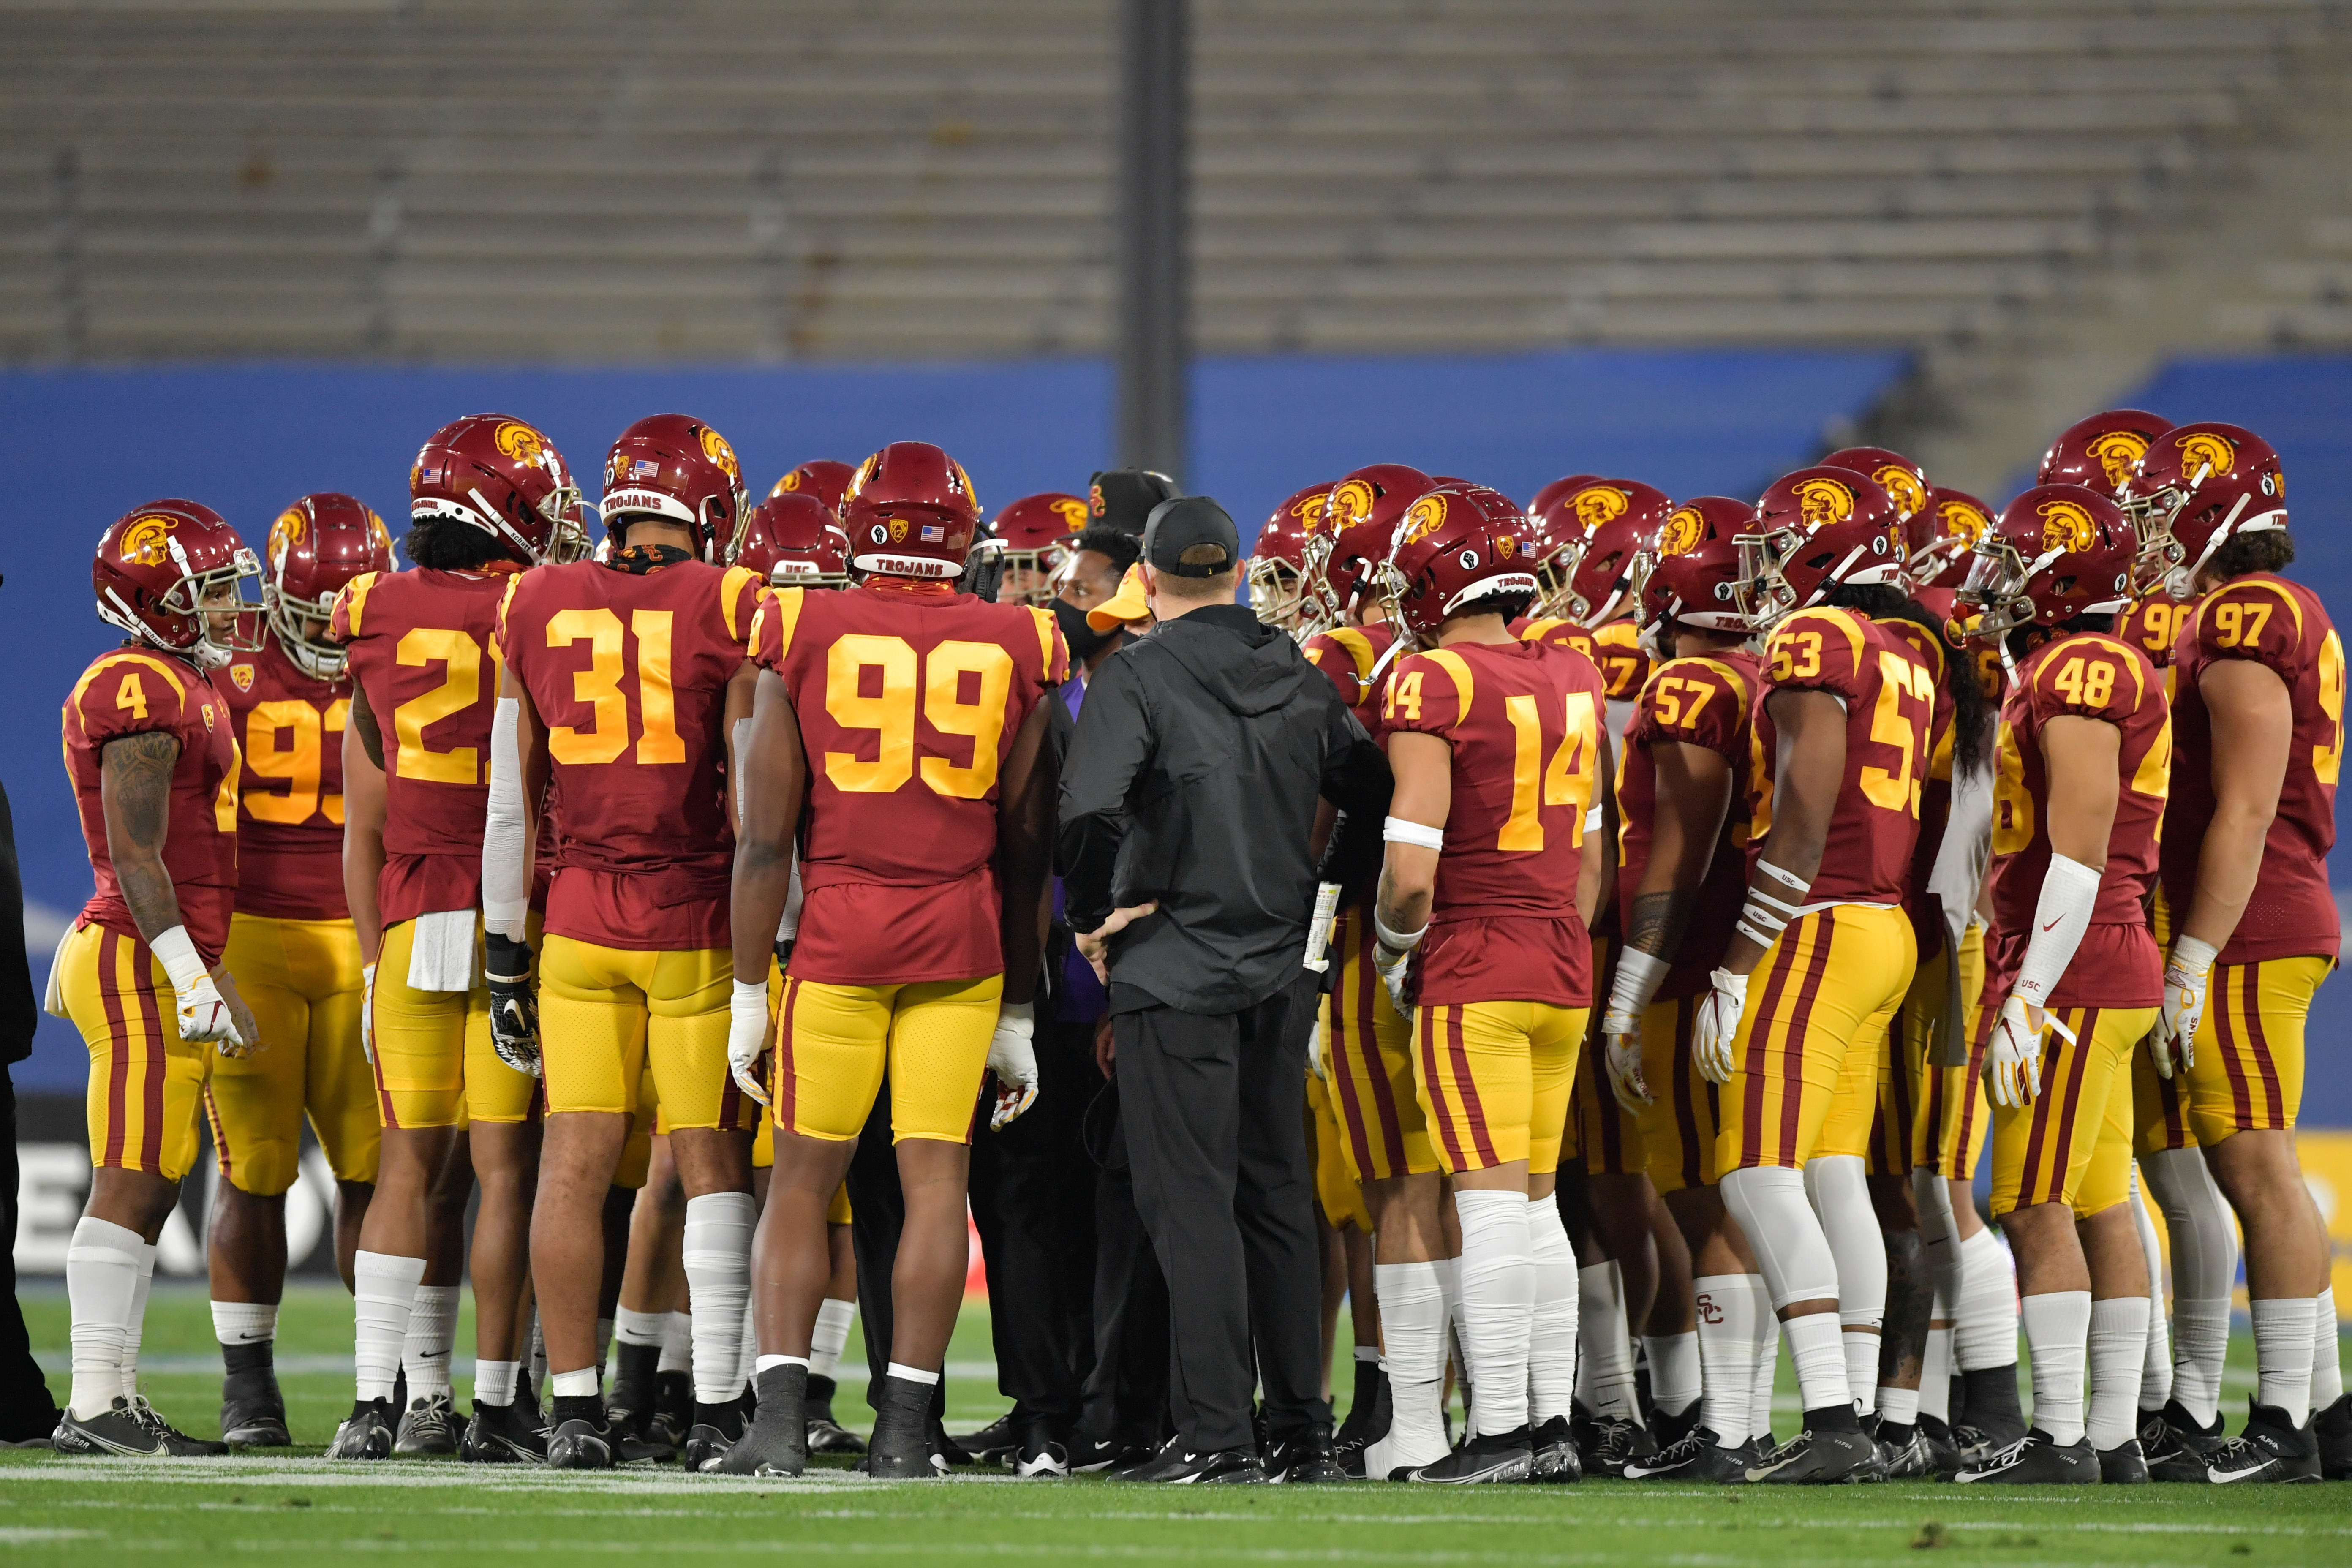 USC team